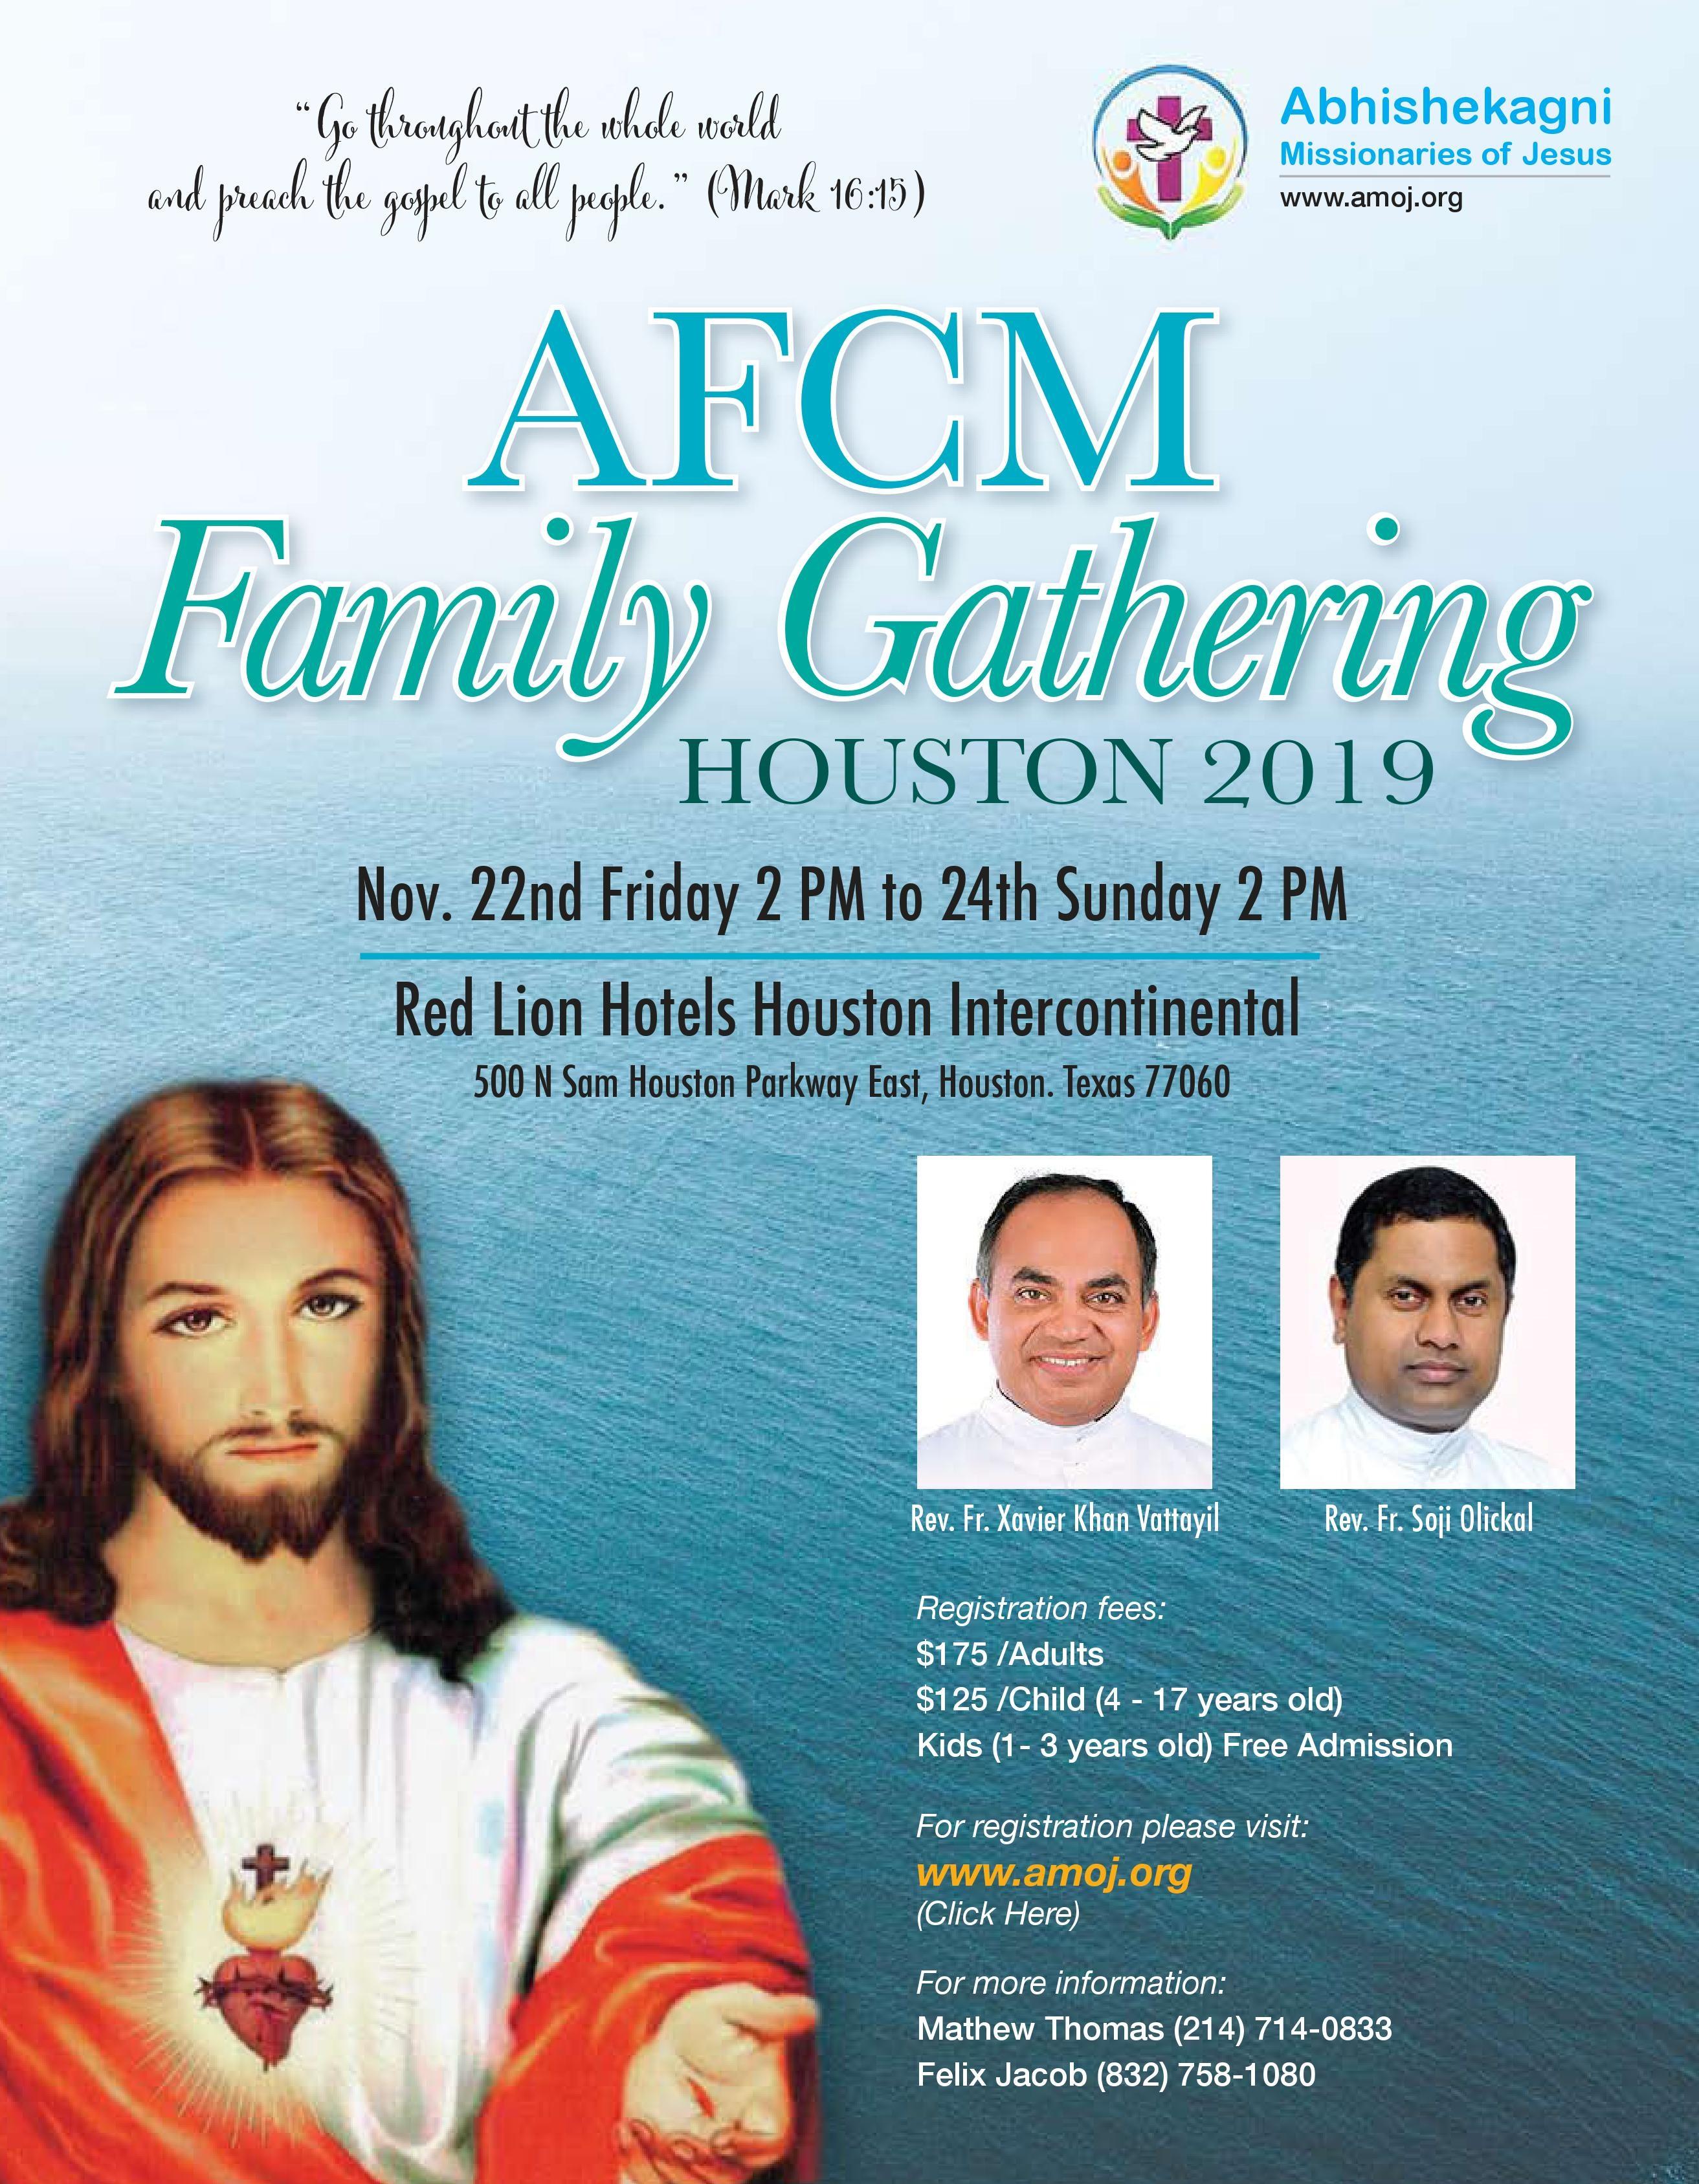 afcm family gathering